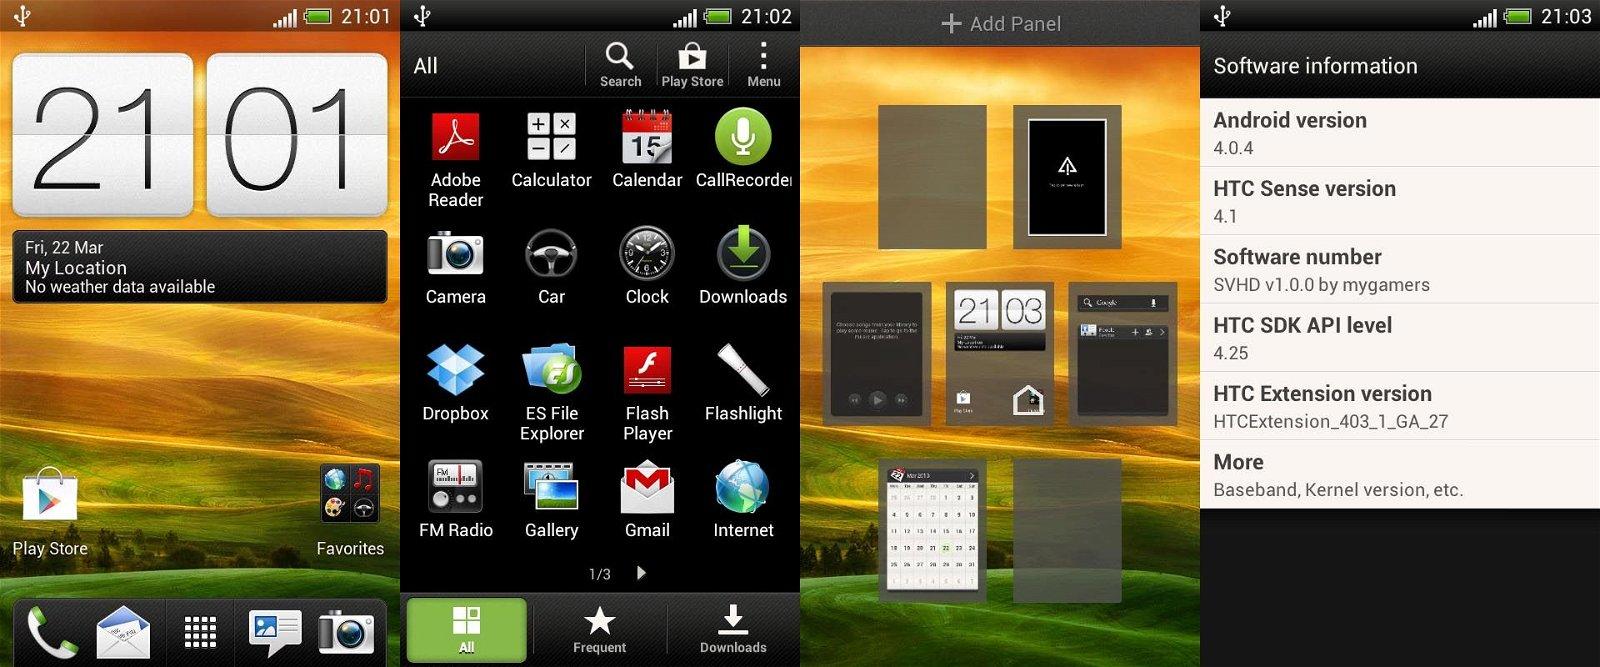 Ppp Widget На Андроид 4.1